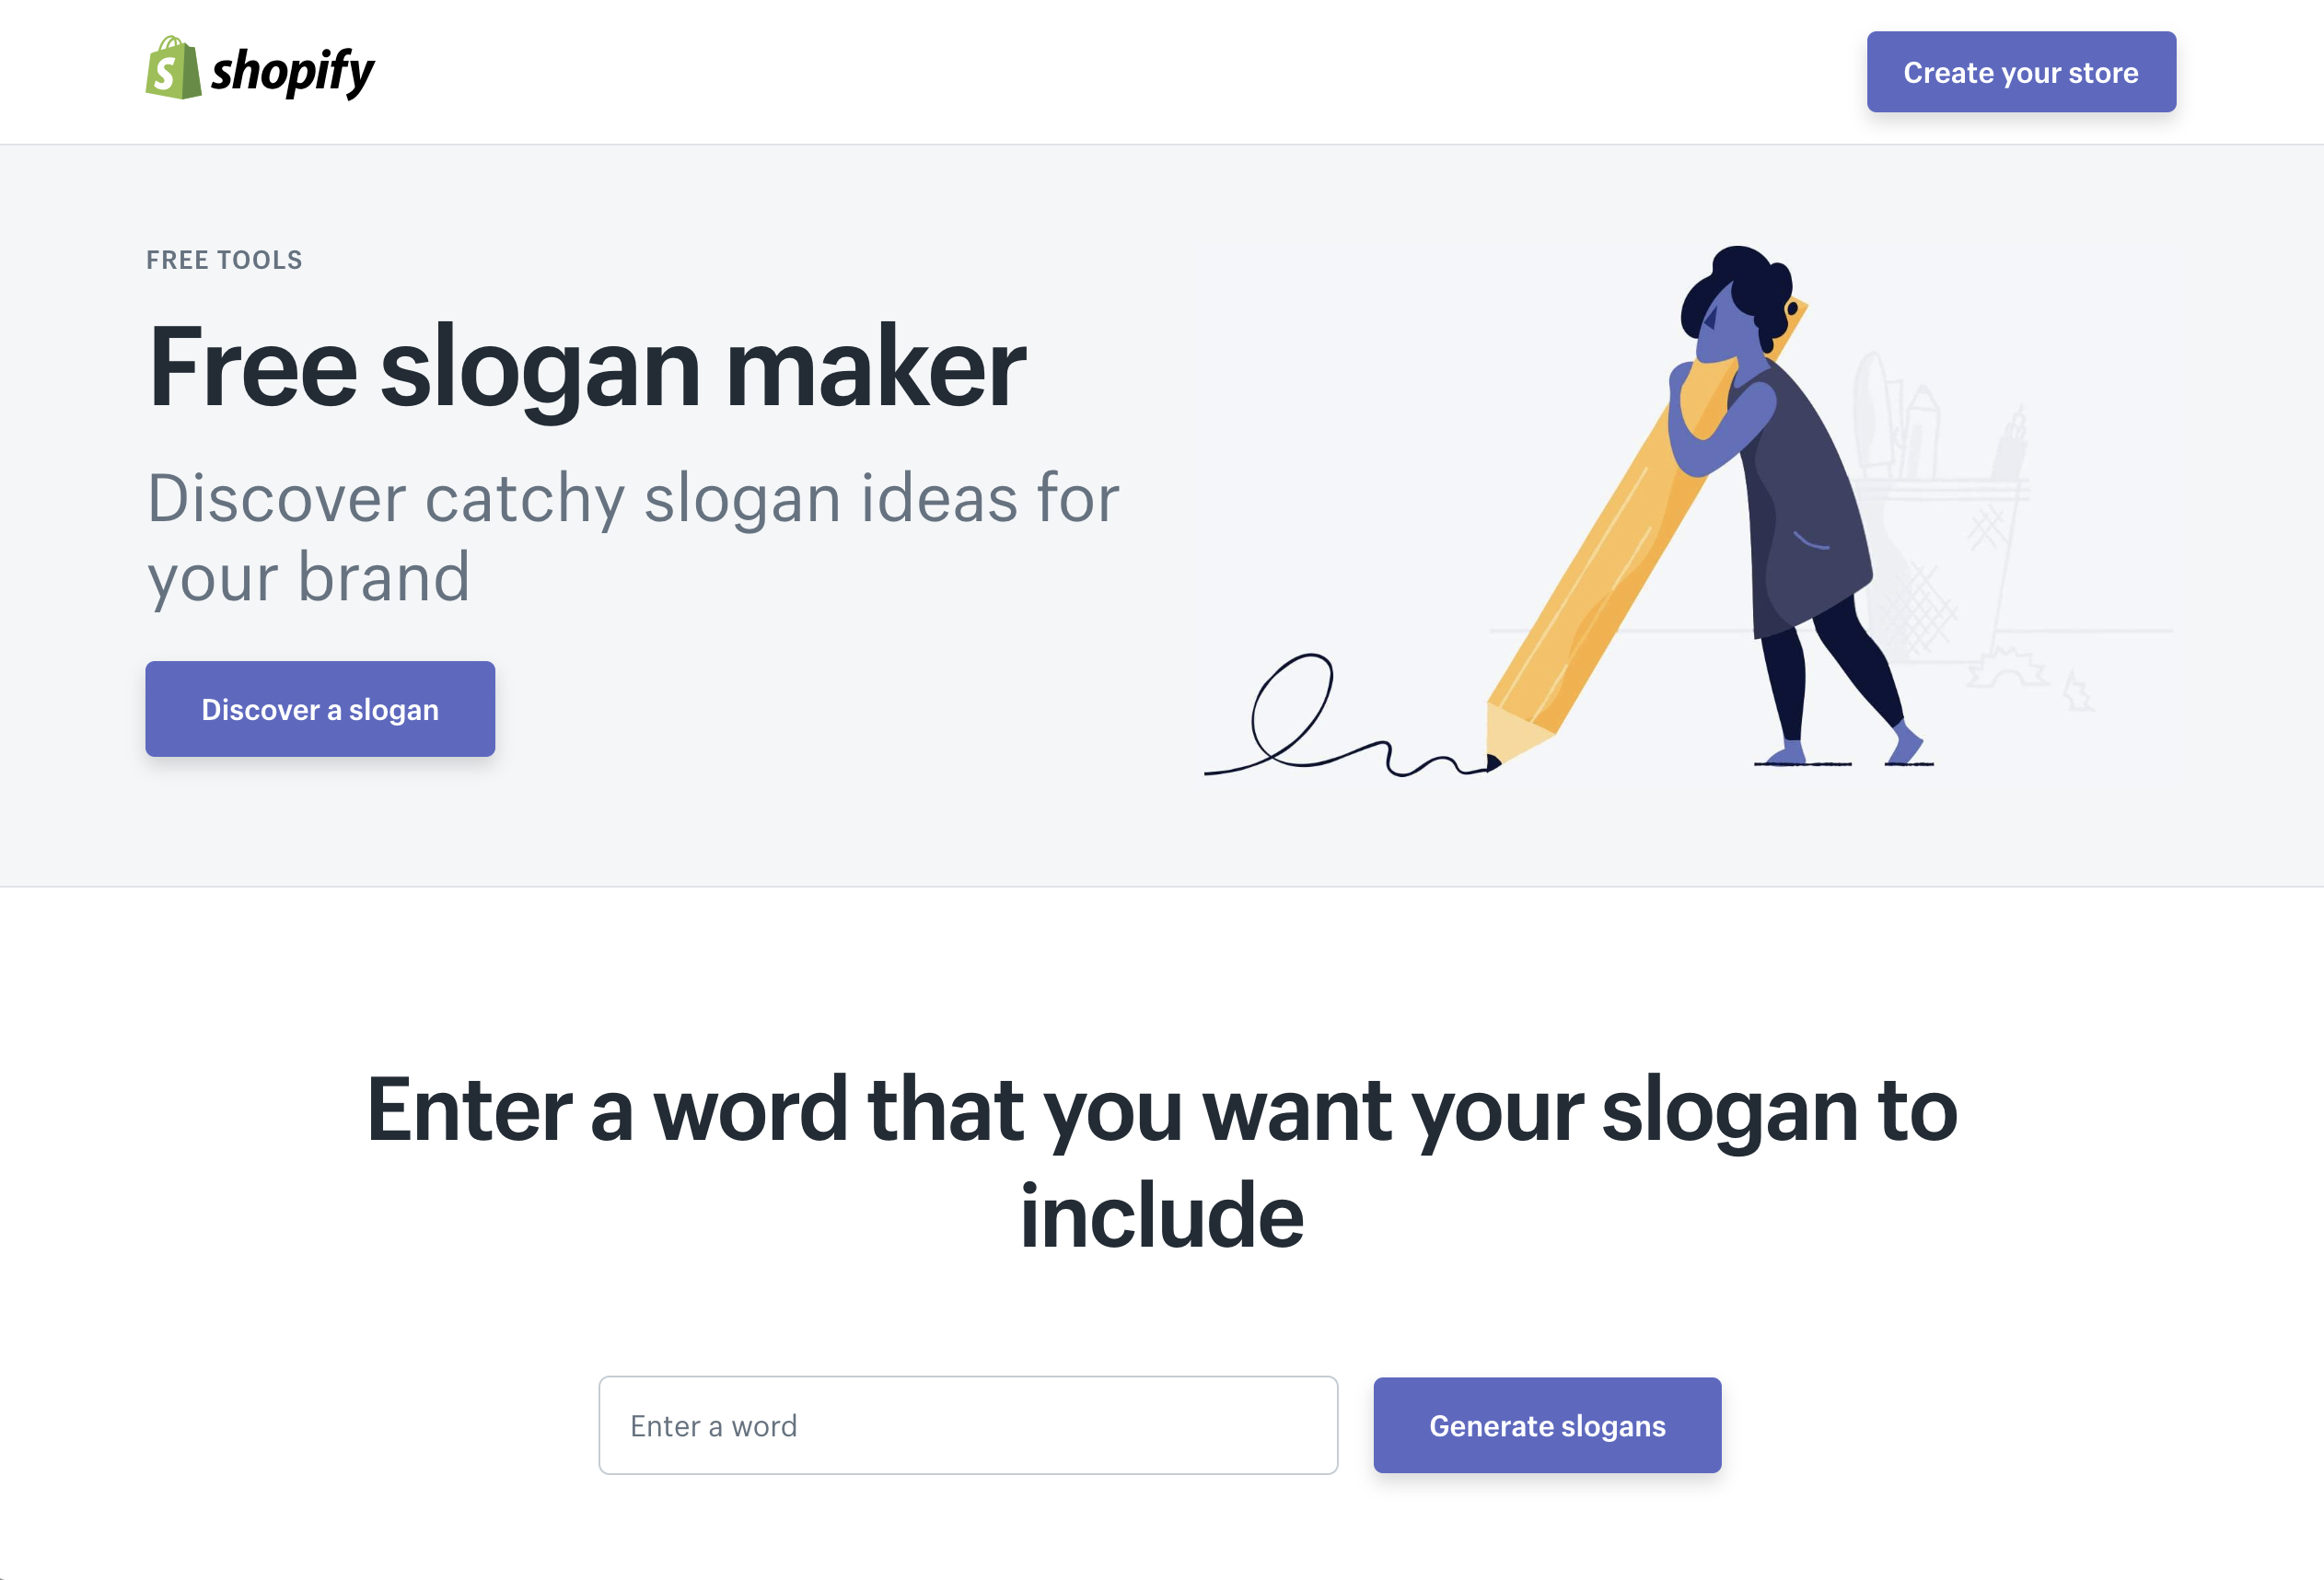 Free Tools - Shopify's Free Slogan Maker